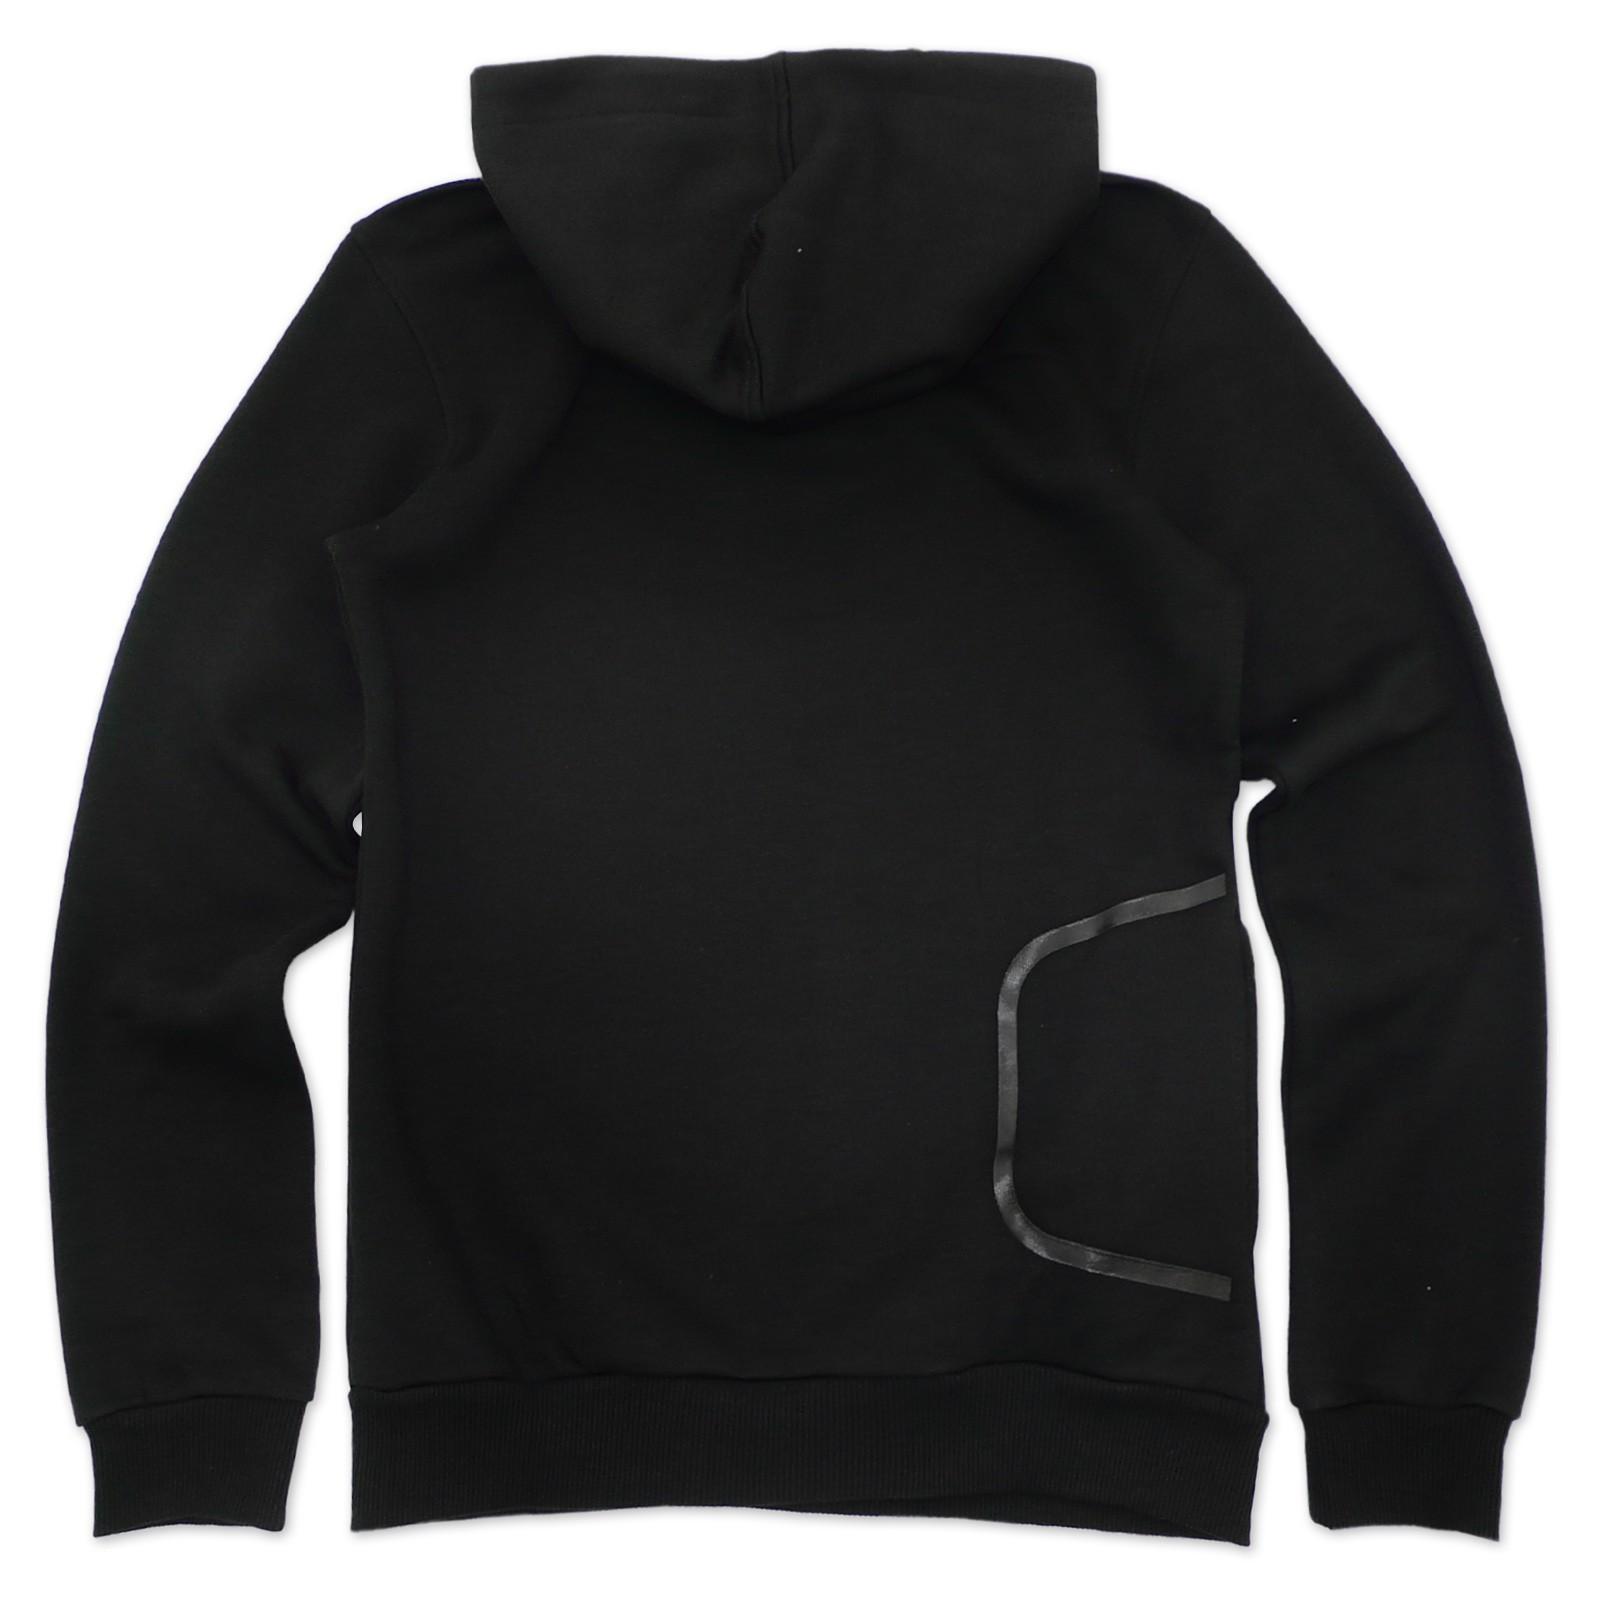 adidas originals herren trefoil hoodie kapuzenpullover schwarz grau xs. Black Bedroom Furniture Sets. Home Design Ideas